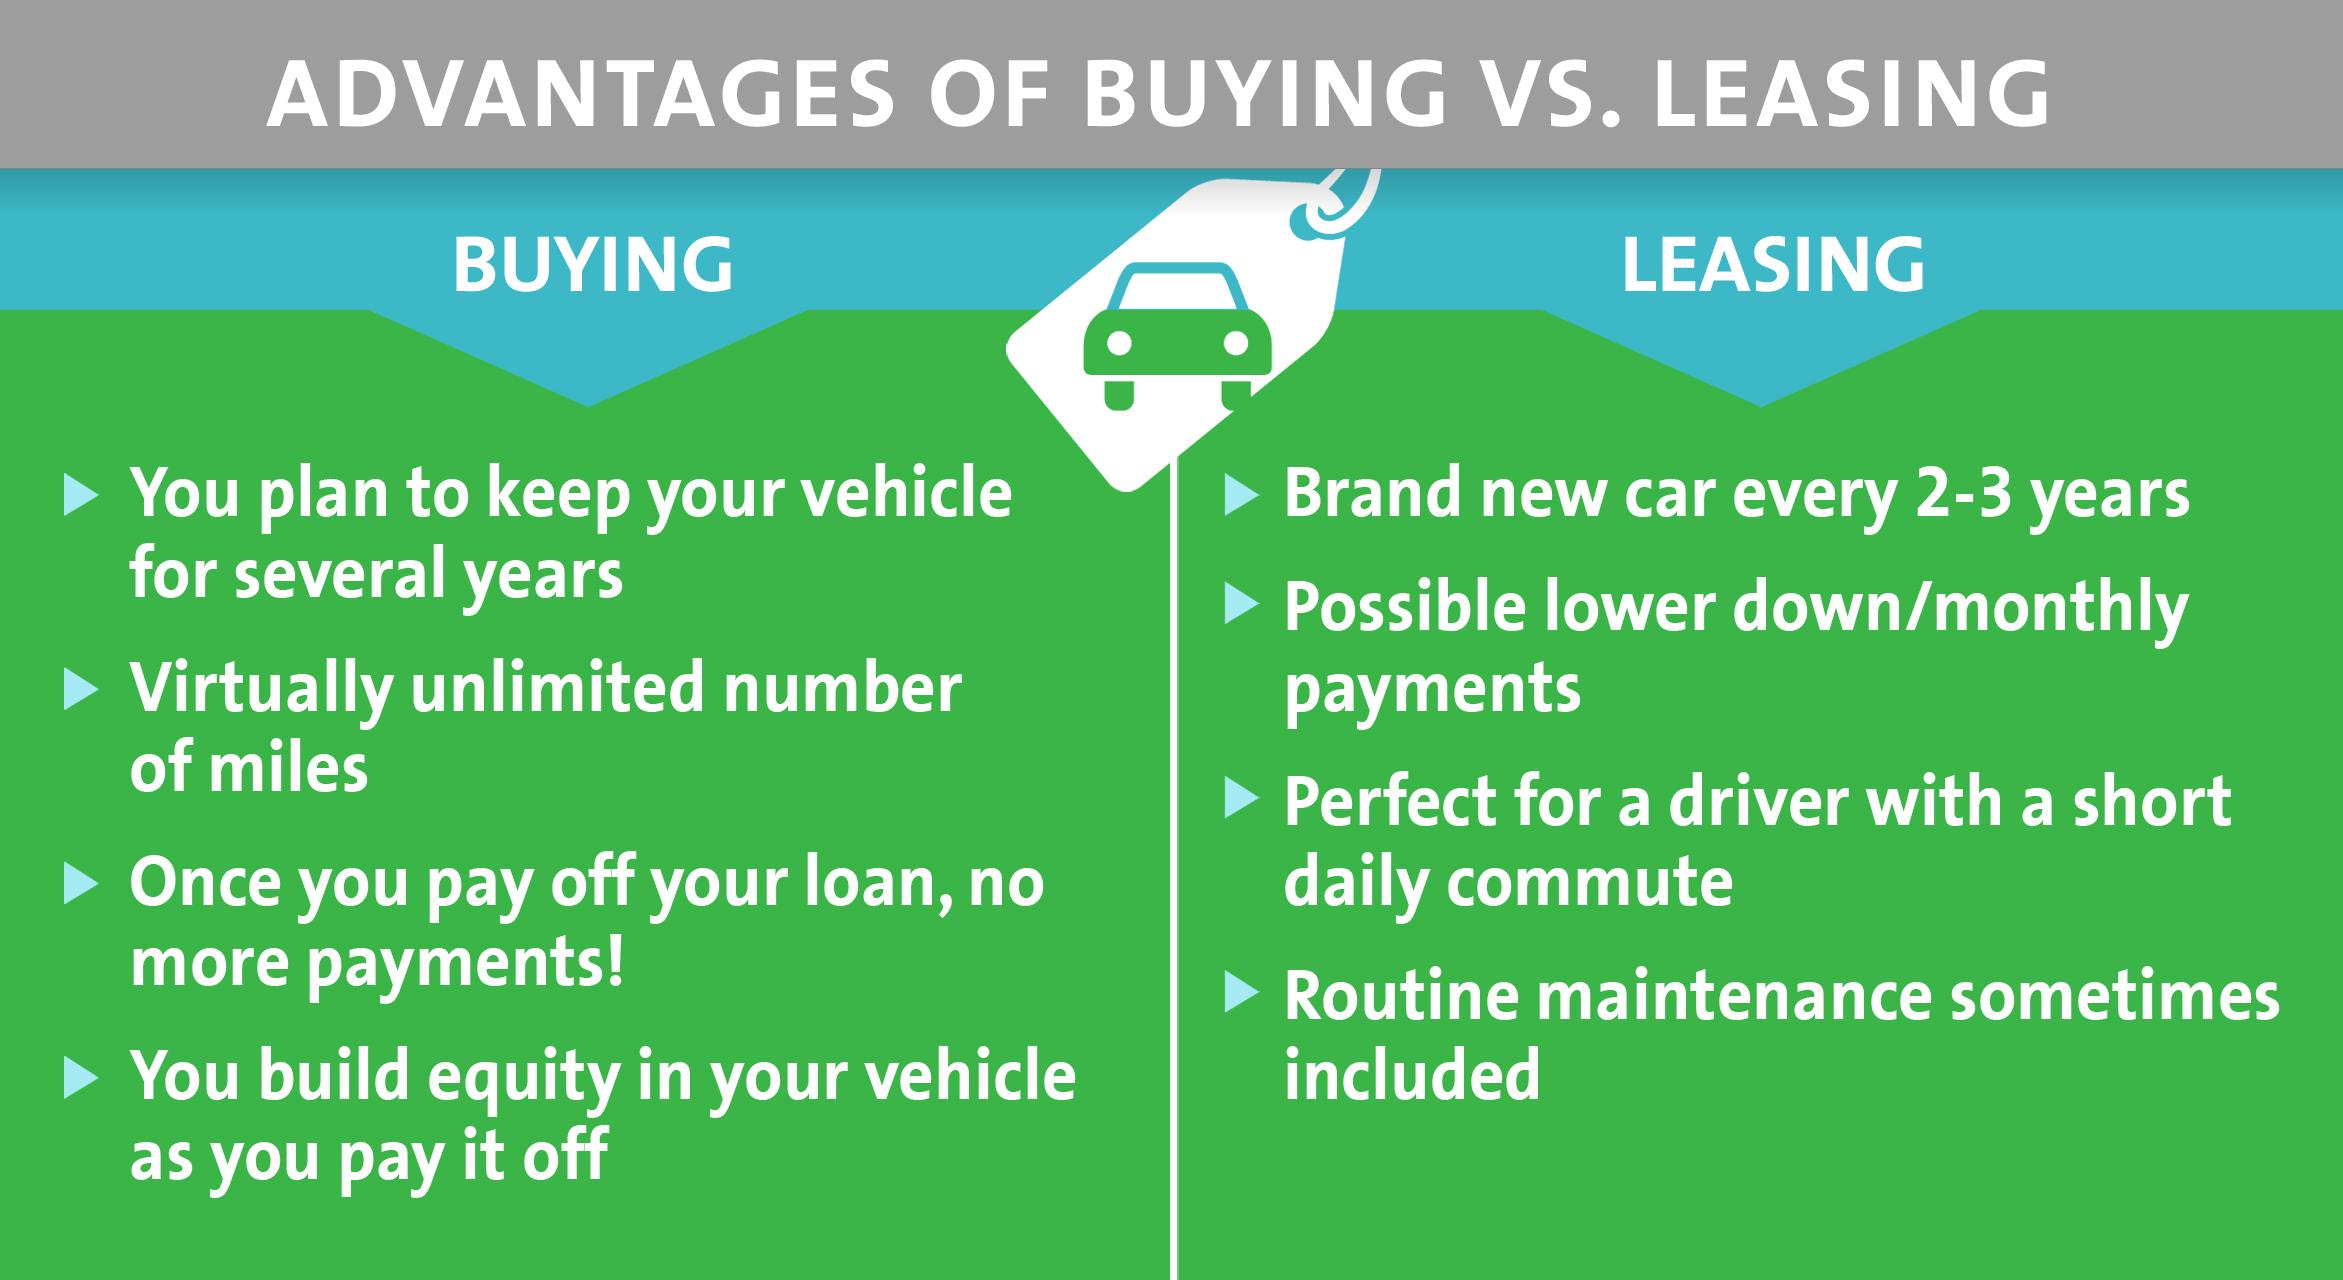 purchasing vs leasing a car